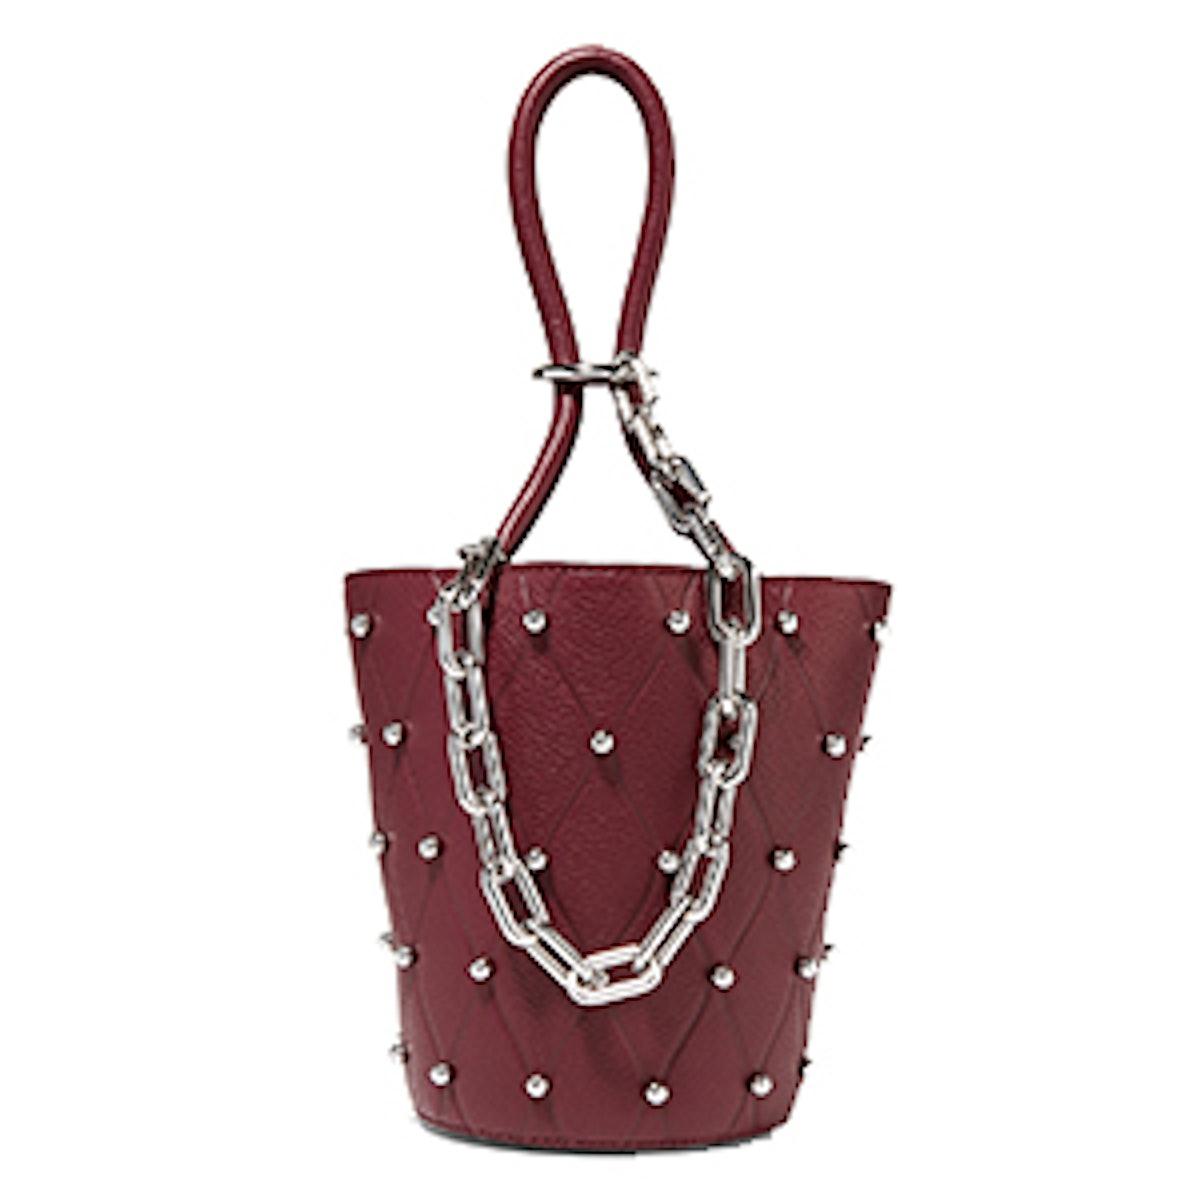 Roxy Mini Studded Textured-Leather Bucket Bag